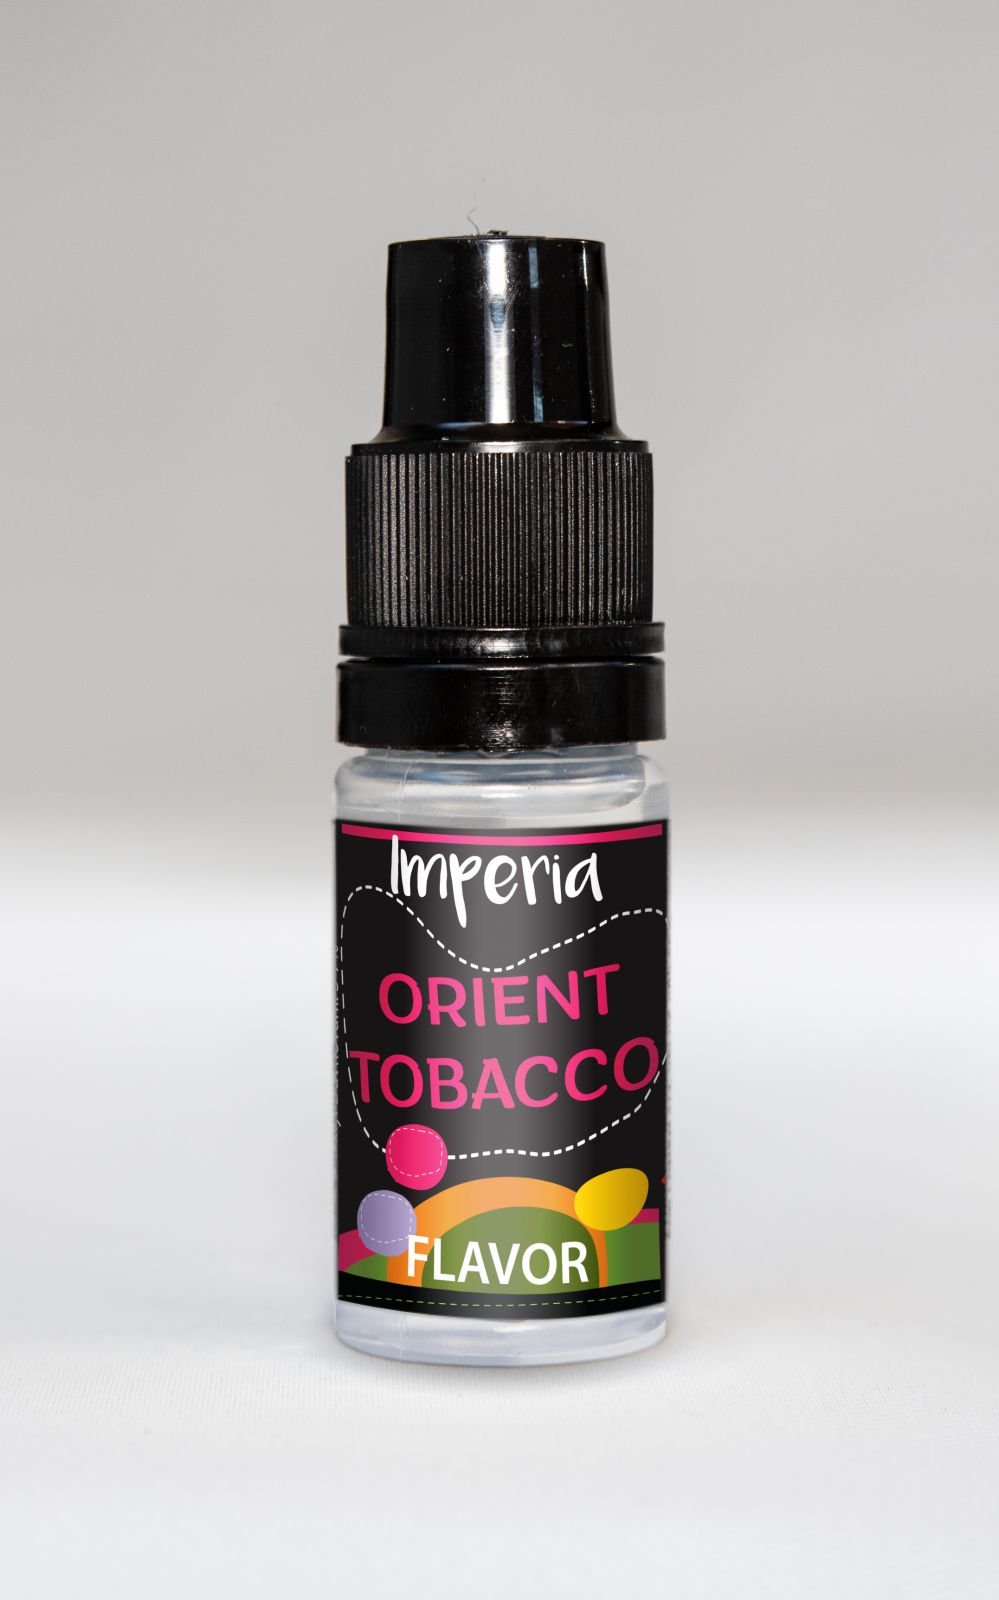 ORIENT TOBACCO - Aroma Imperia Black Label Boudoir Samadhi s.r.o.